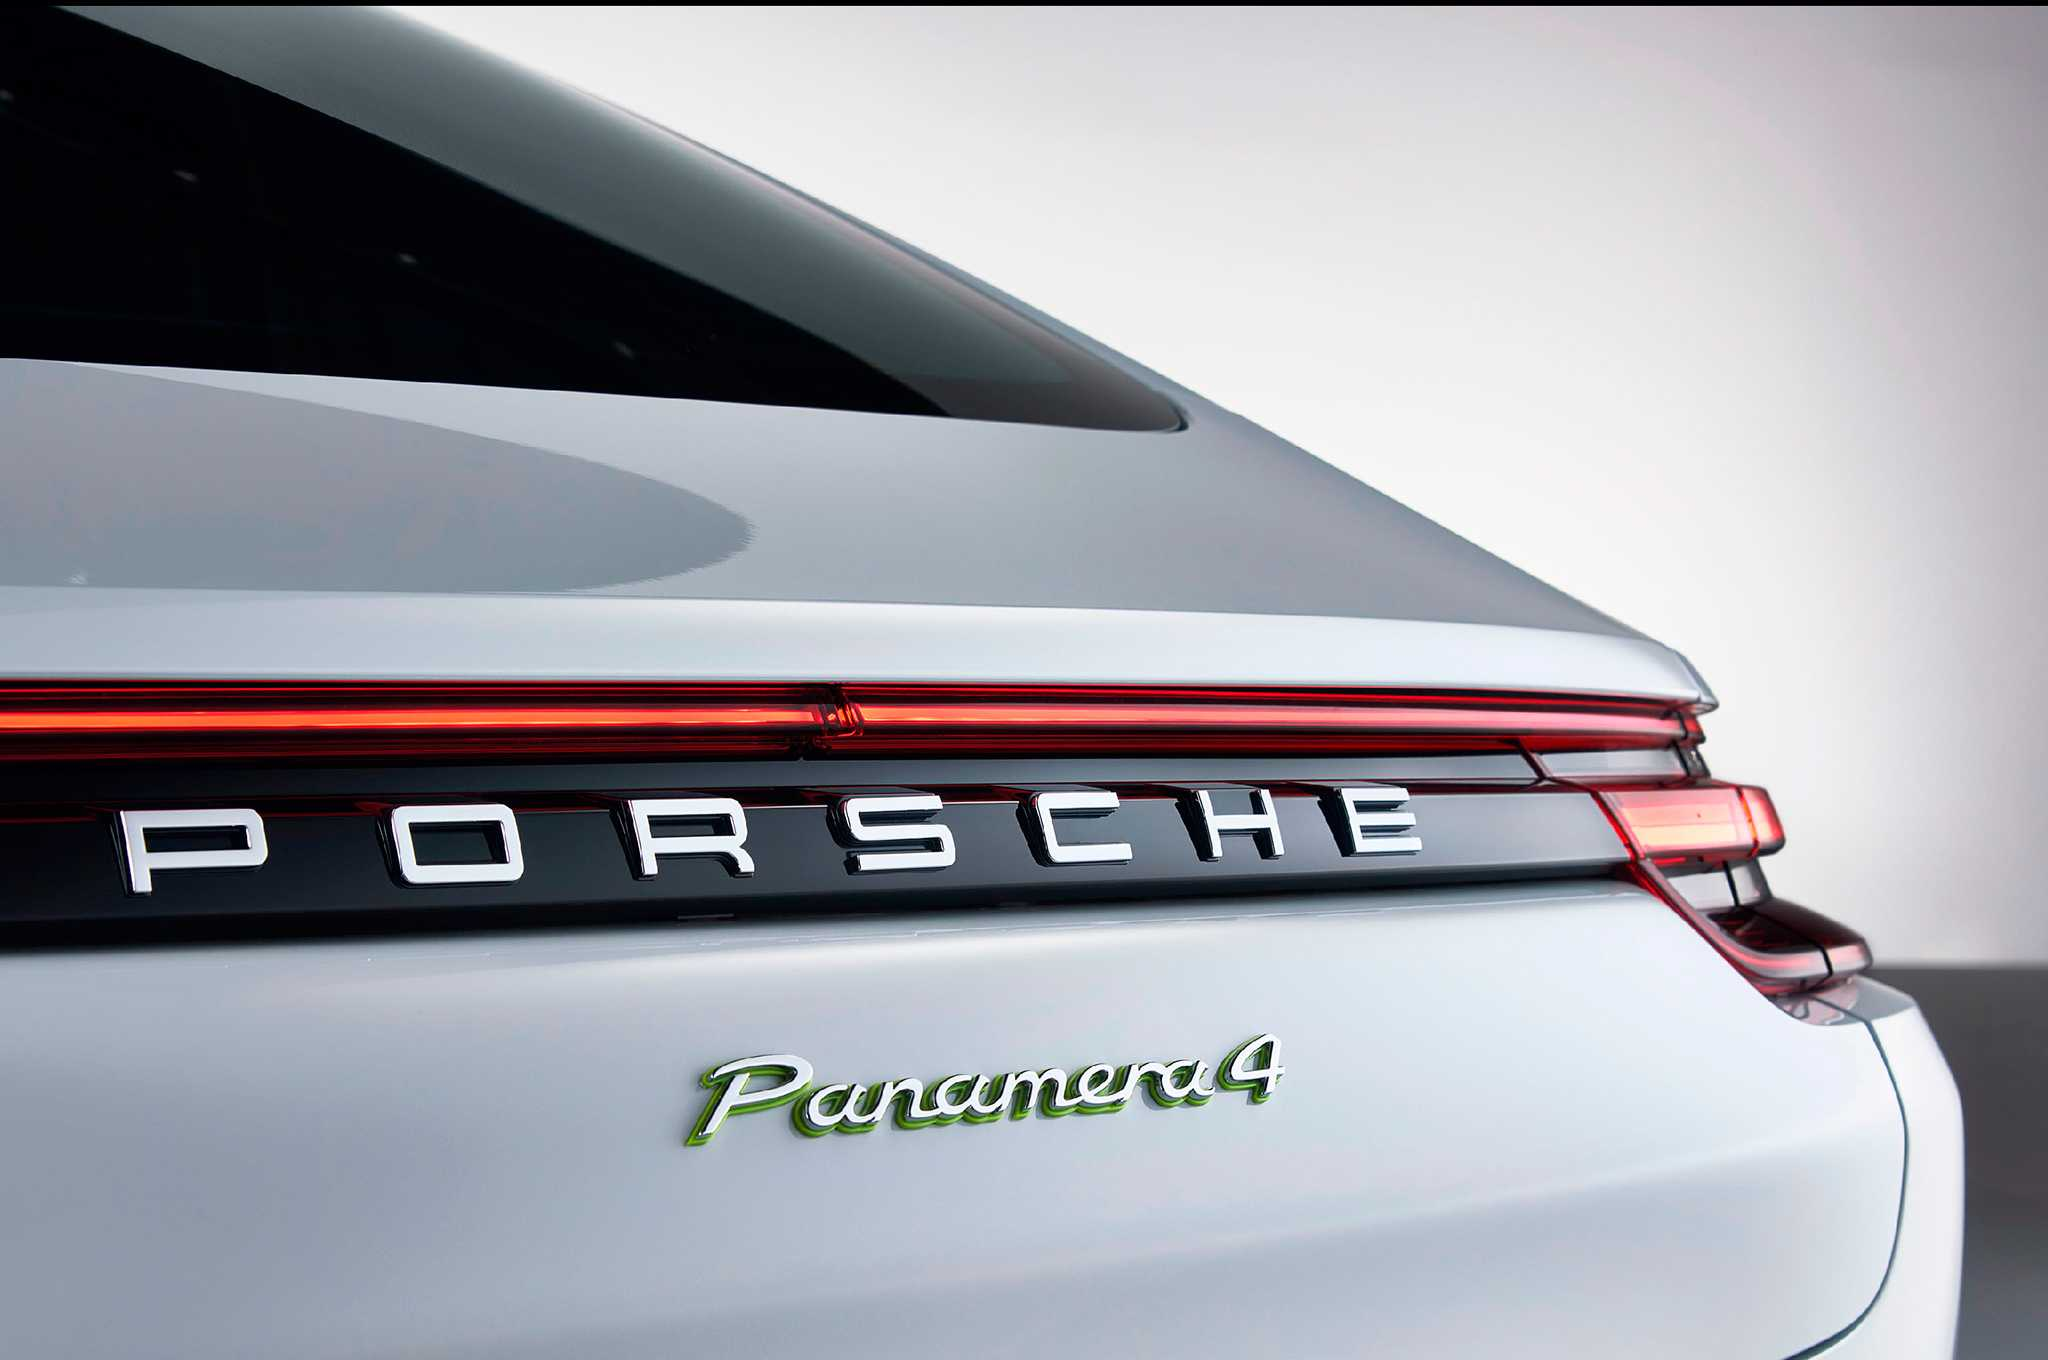 Porsche Panamera 4 E-Hybrid Revealed